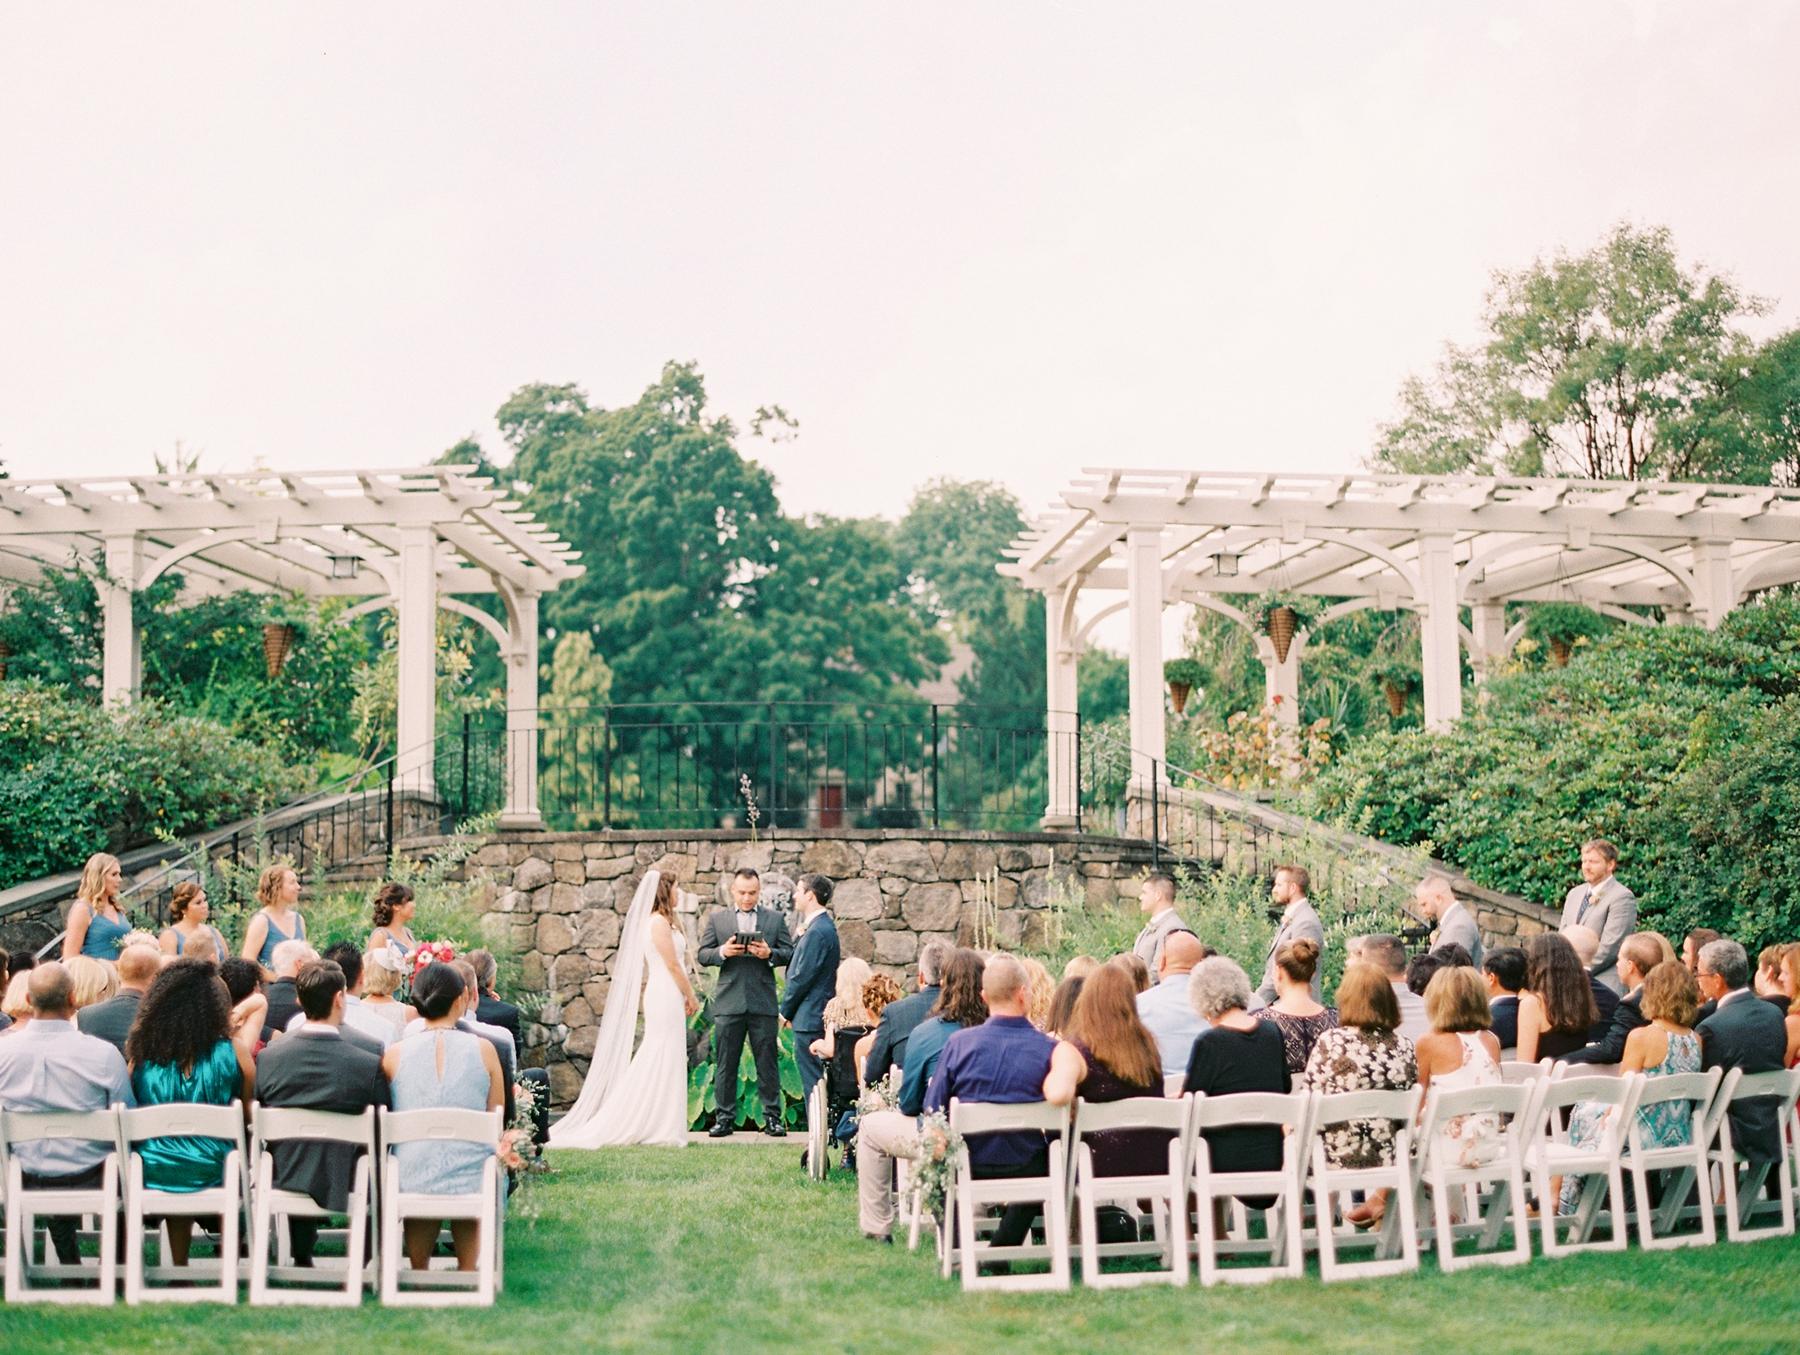 Outdoor Wedding Ceremony at Botanical Garden